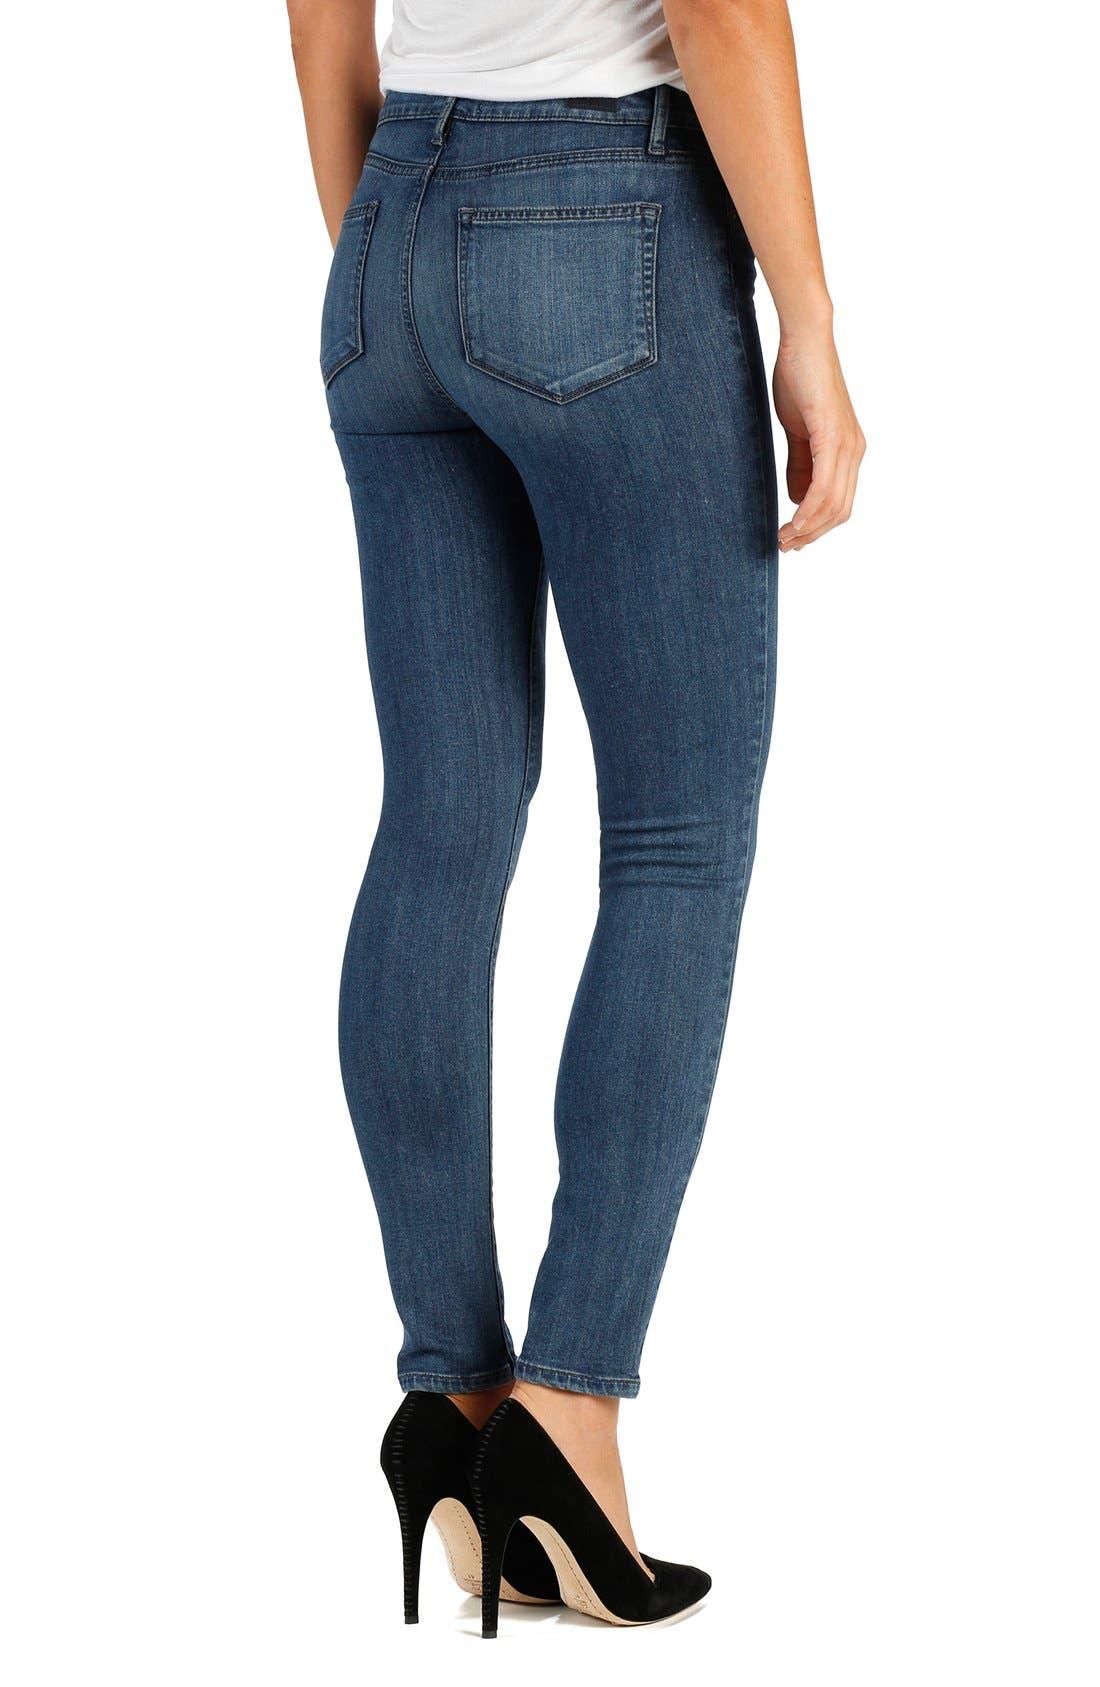 'Transcend - Hoxton' High Rise Ankle Peg Skinny Jeans,                             Alternate thumbnail 2, color,                             400